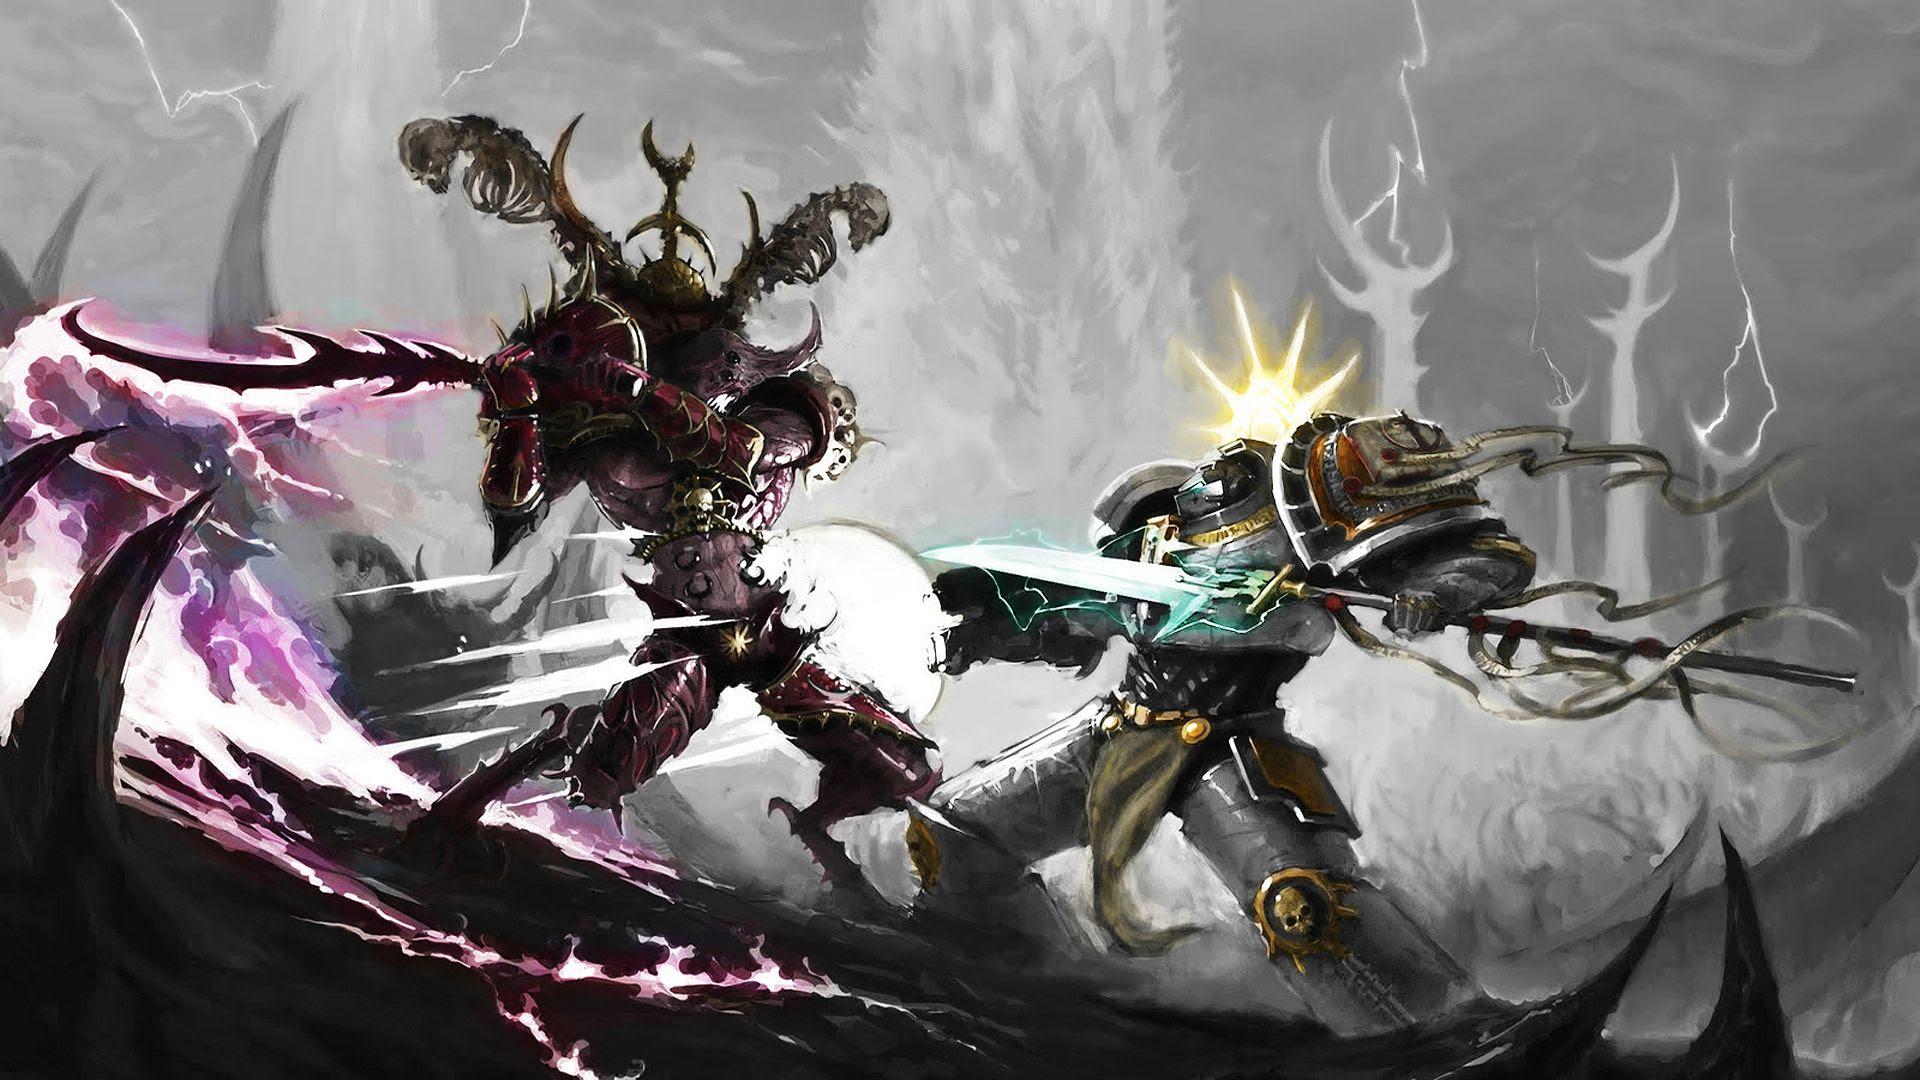 Warhammer 40k Wallpapers Post Yours Below Warhammer40k